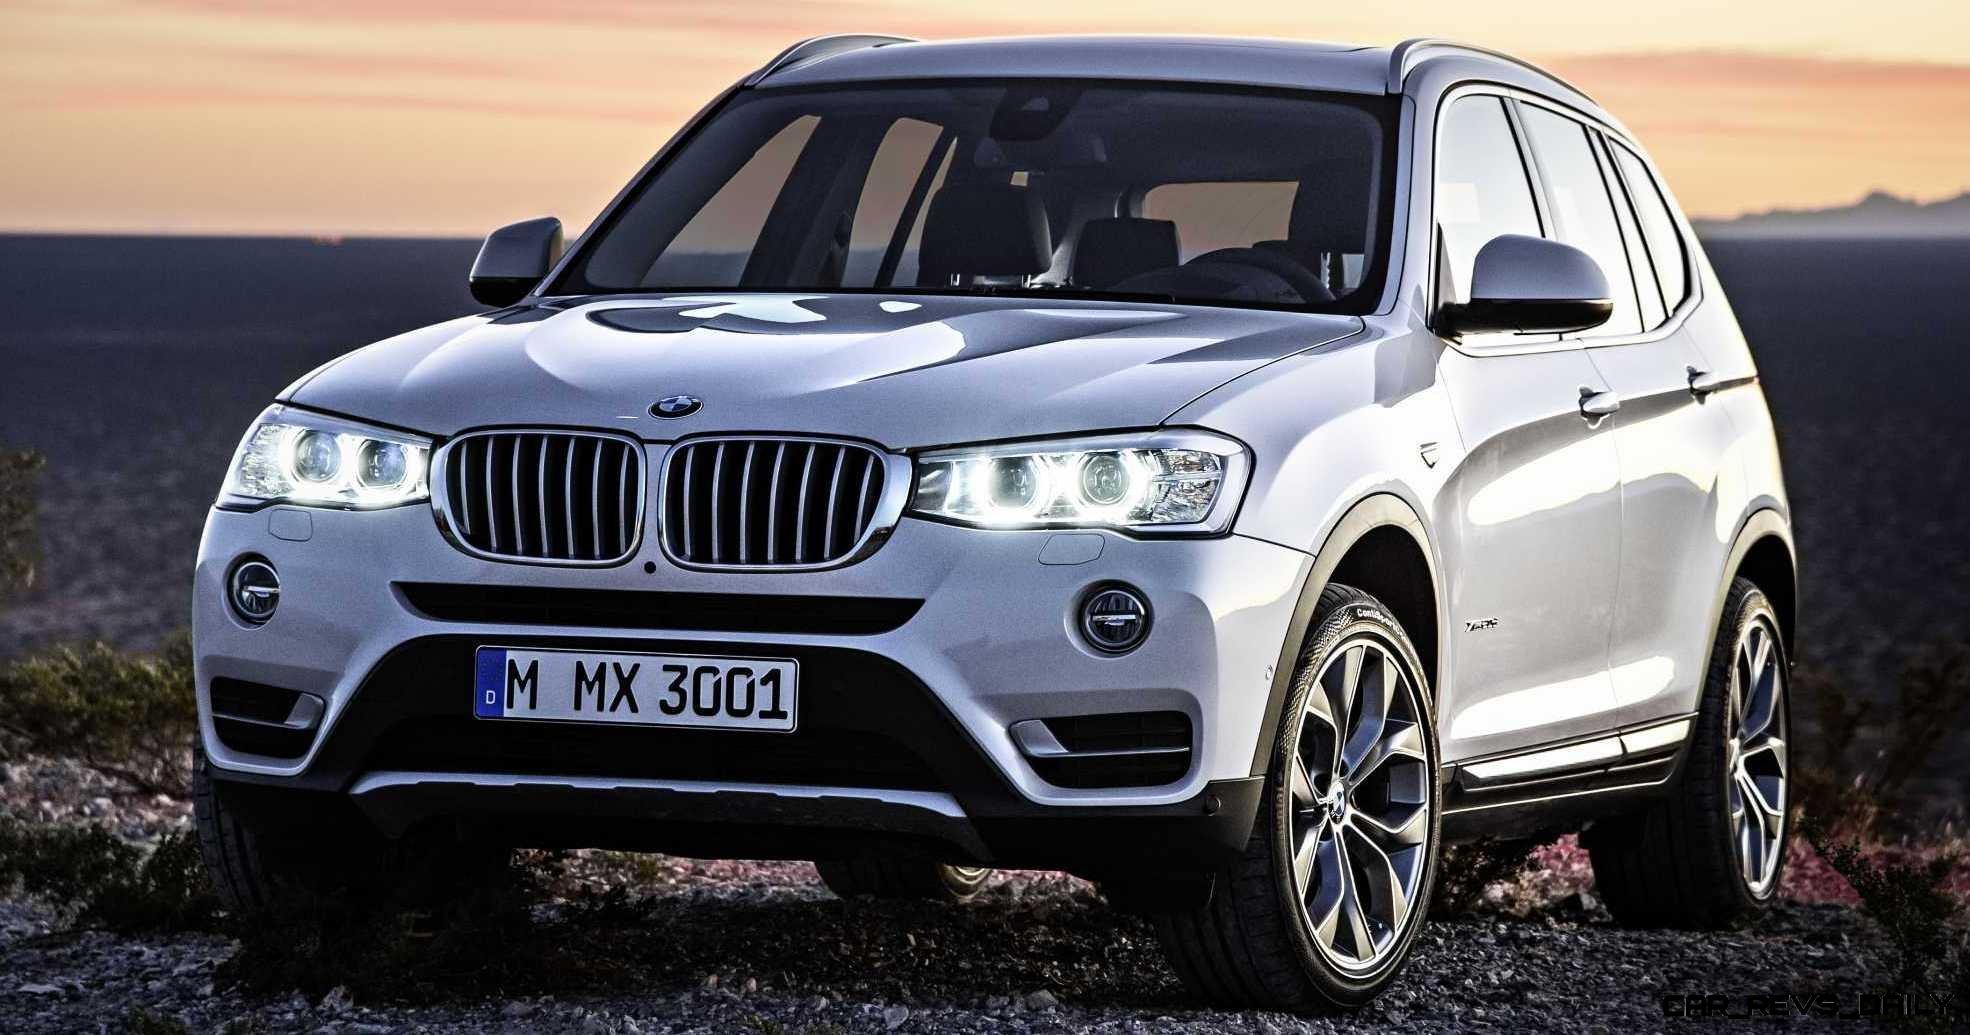 Swanky 2015 BMW X3 xLine Debuts In Chicago Ahead of Spring 2014 Arrival In U.S. Showrooms 28